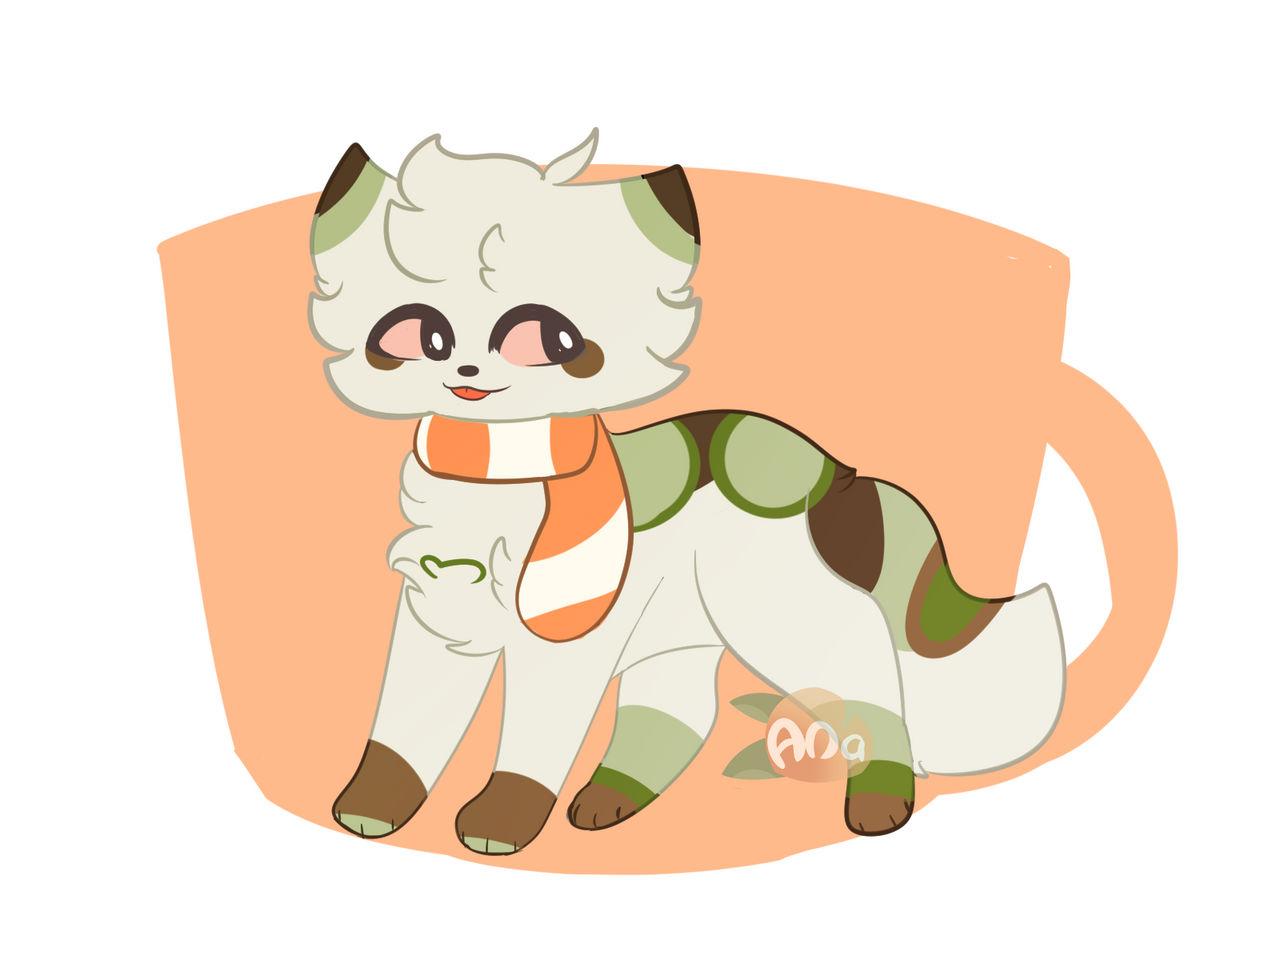 Commission for Mink